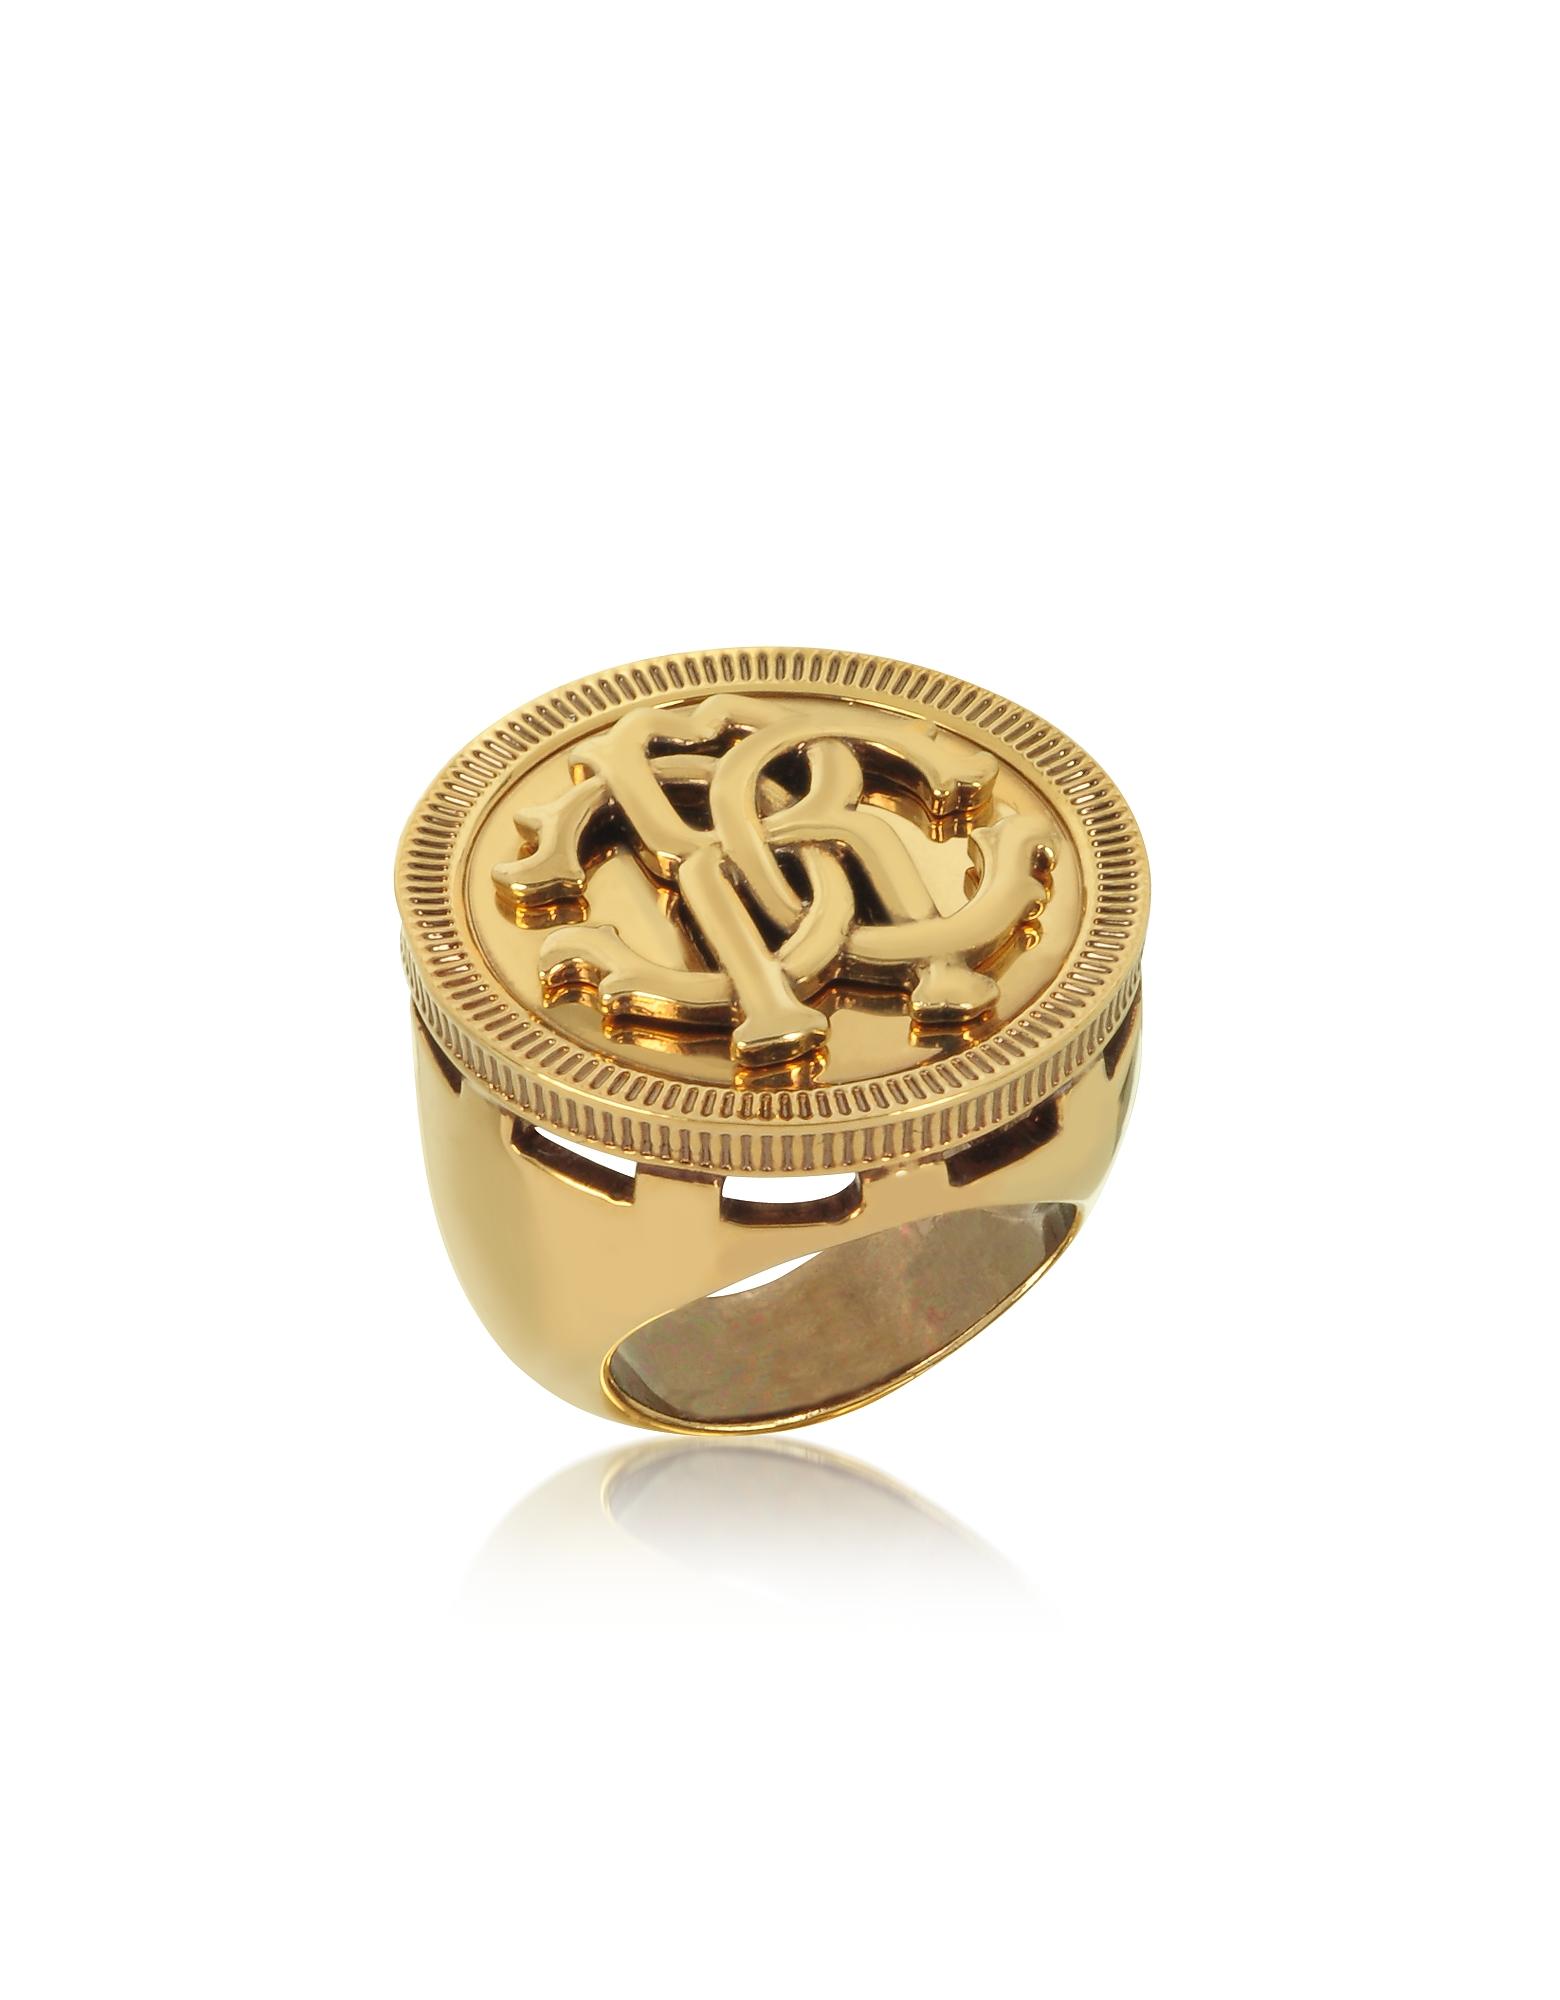 Roberto Cavalli ANTIQUE GOLDTONE METAL LARGE LOGO COIN RING